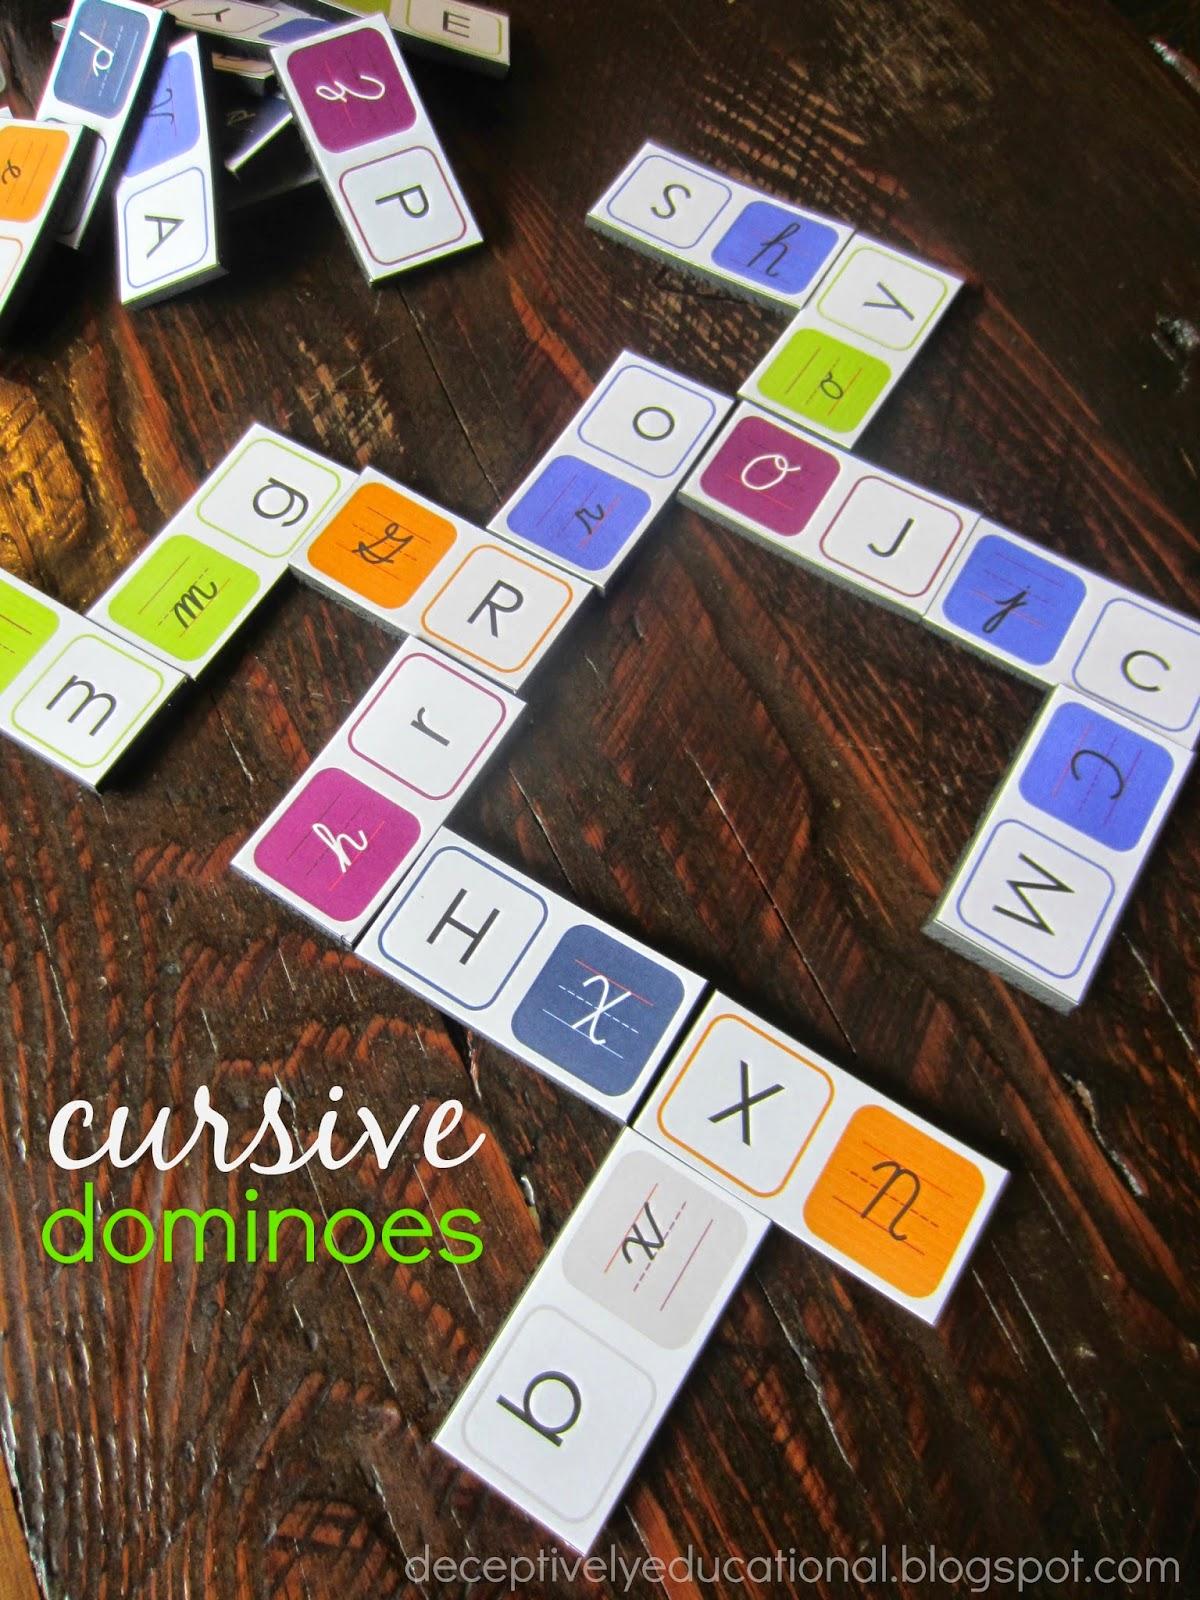 Relentlessly Fun Deceptively Educational Free Printable Cursive Dominoes